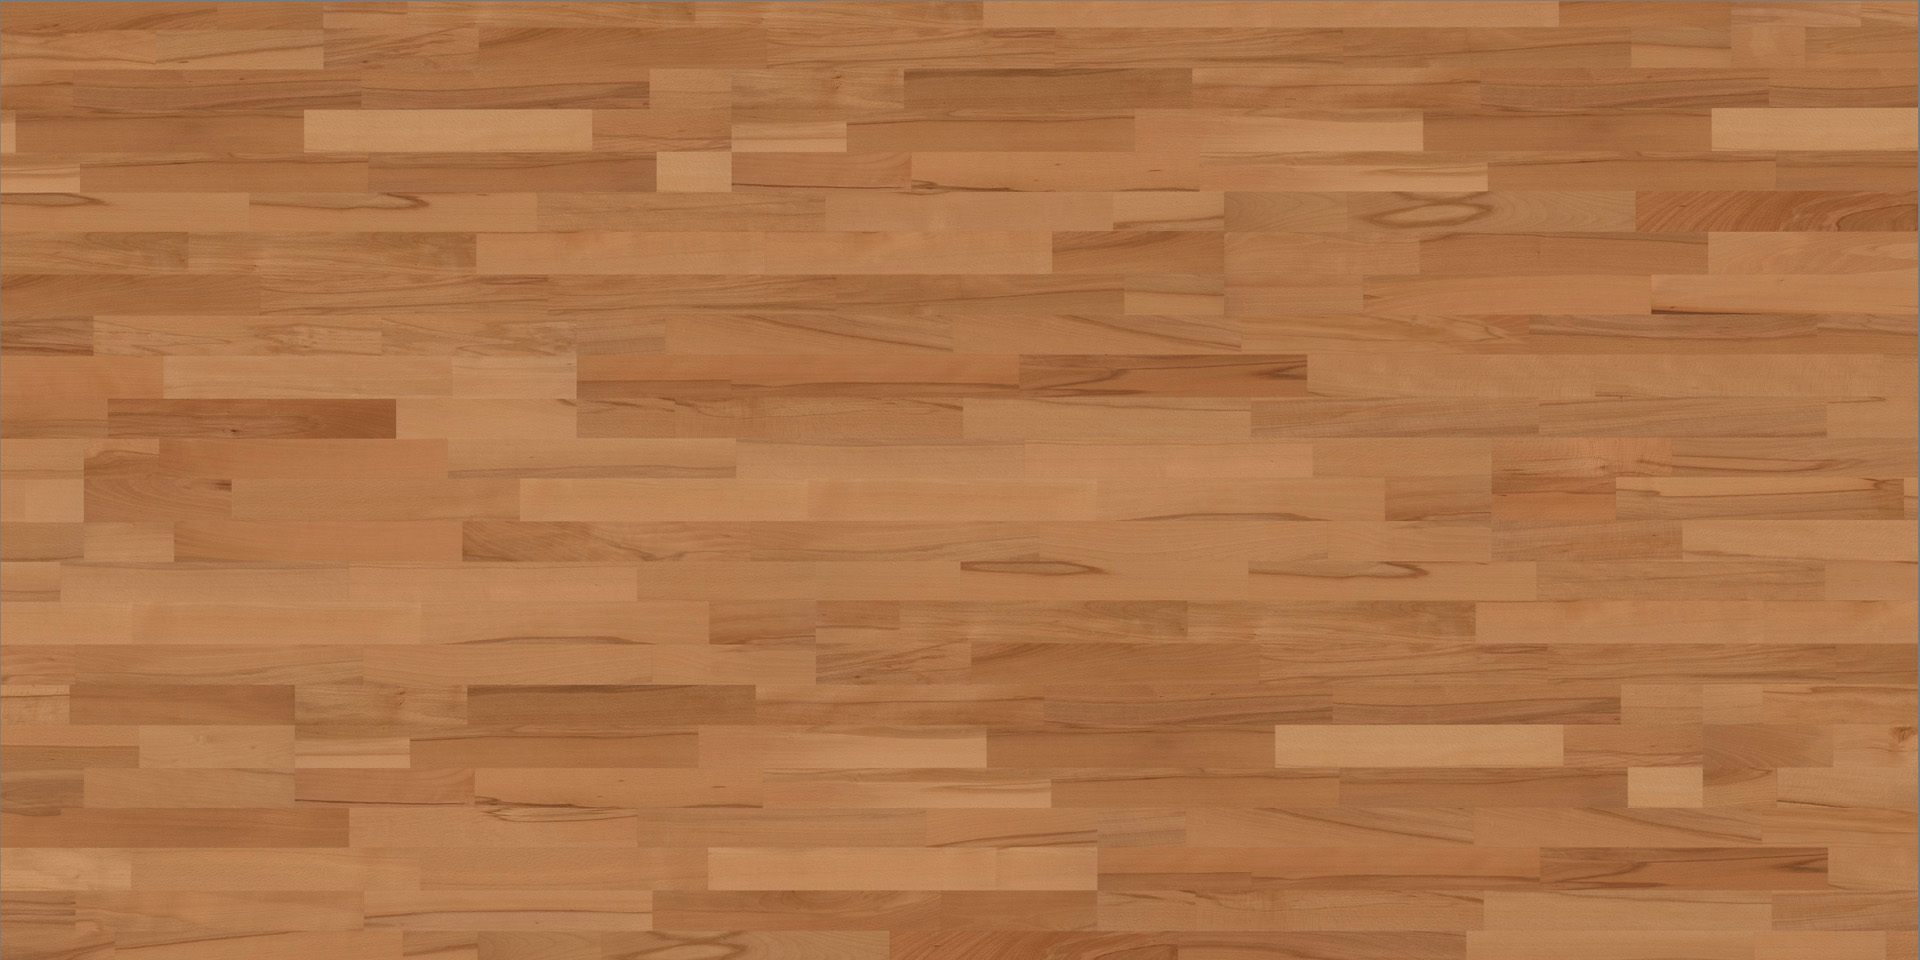 fertigparket buche ged mpft rustikal nut feder 3 stab fertigparkett lackiert der boden. Black Bedroom Furniture Sets. Home Design Ideas